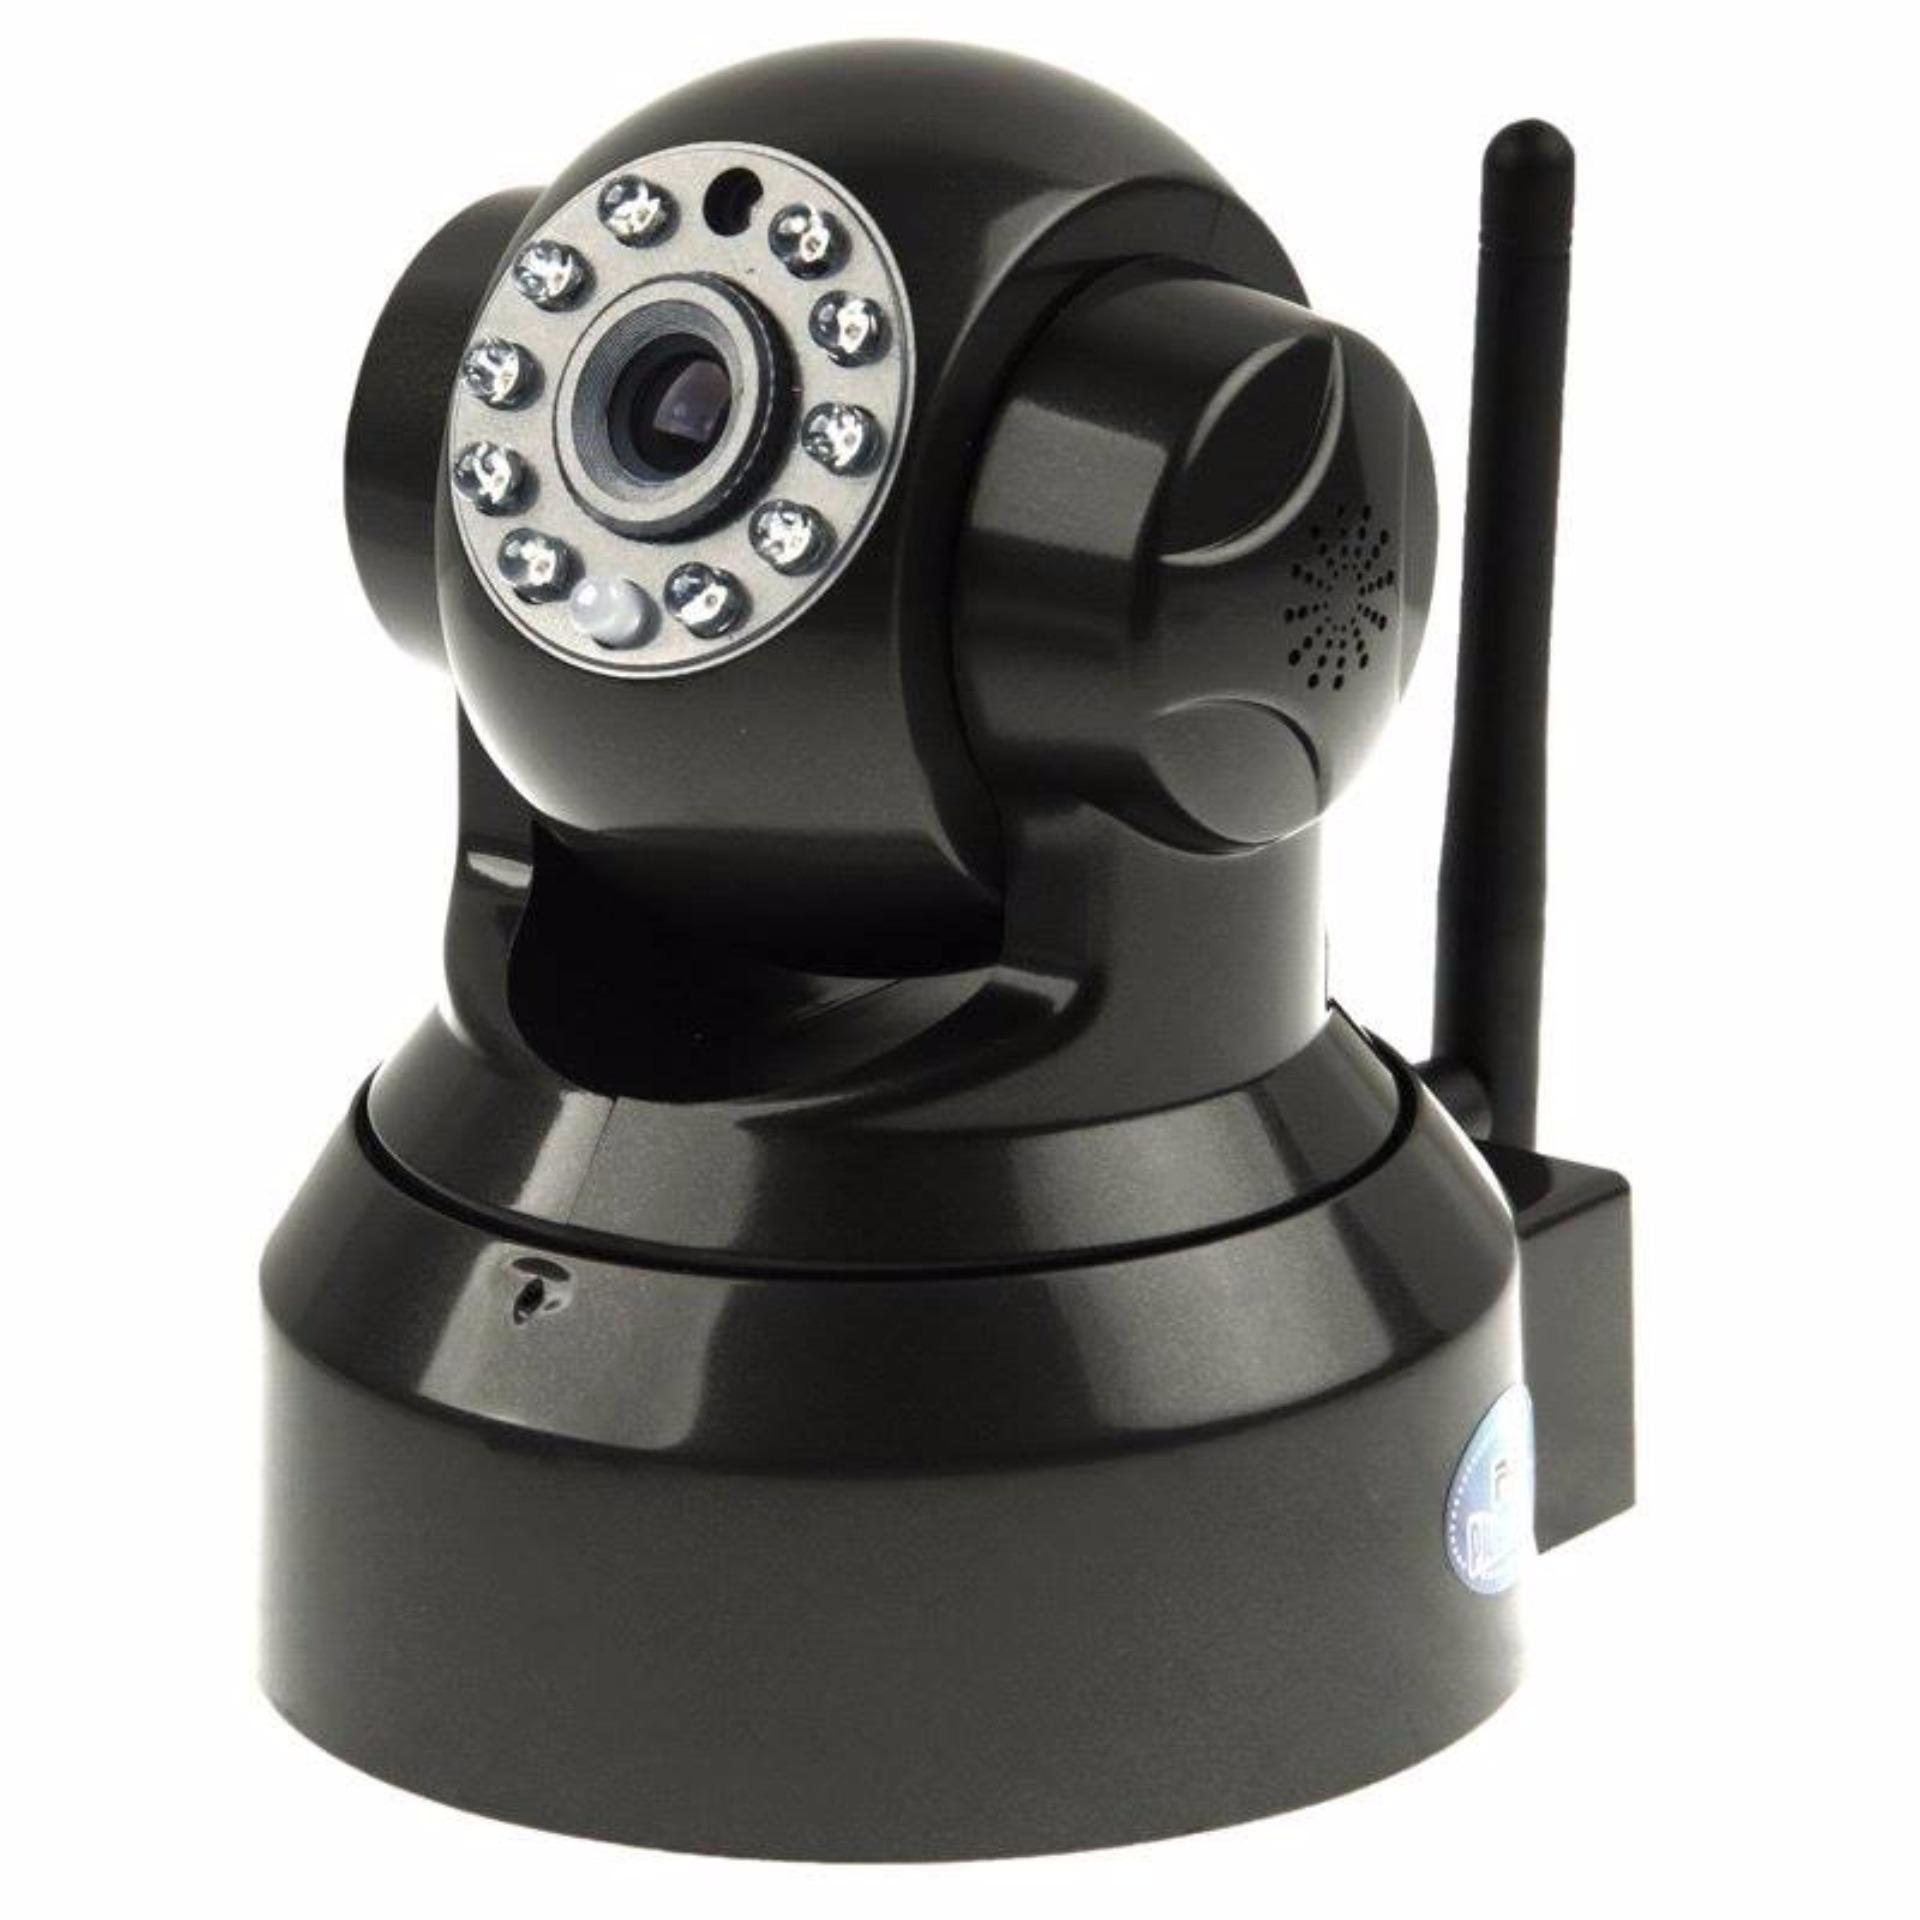 VStarcam C7837WIP Home monitoring IP Camera